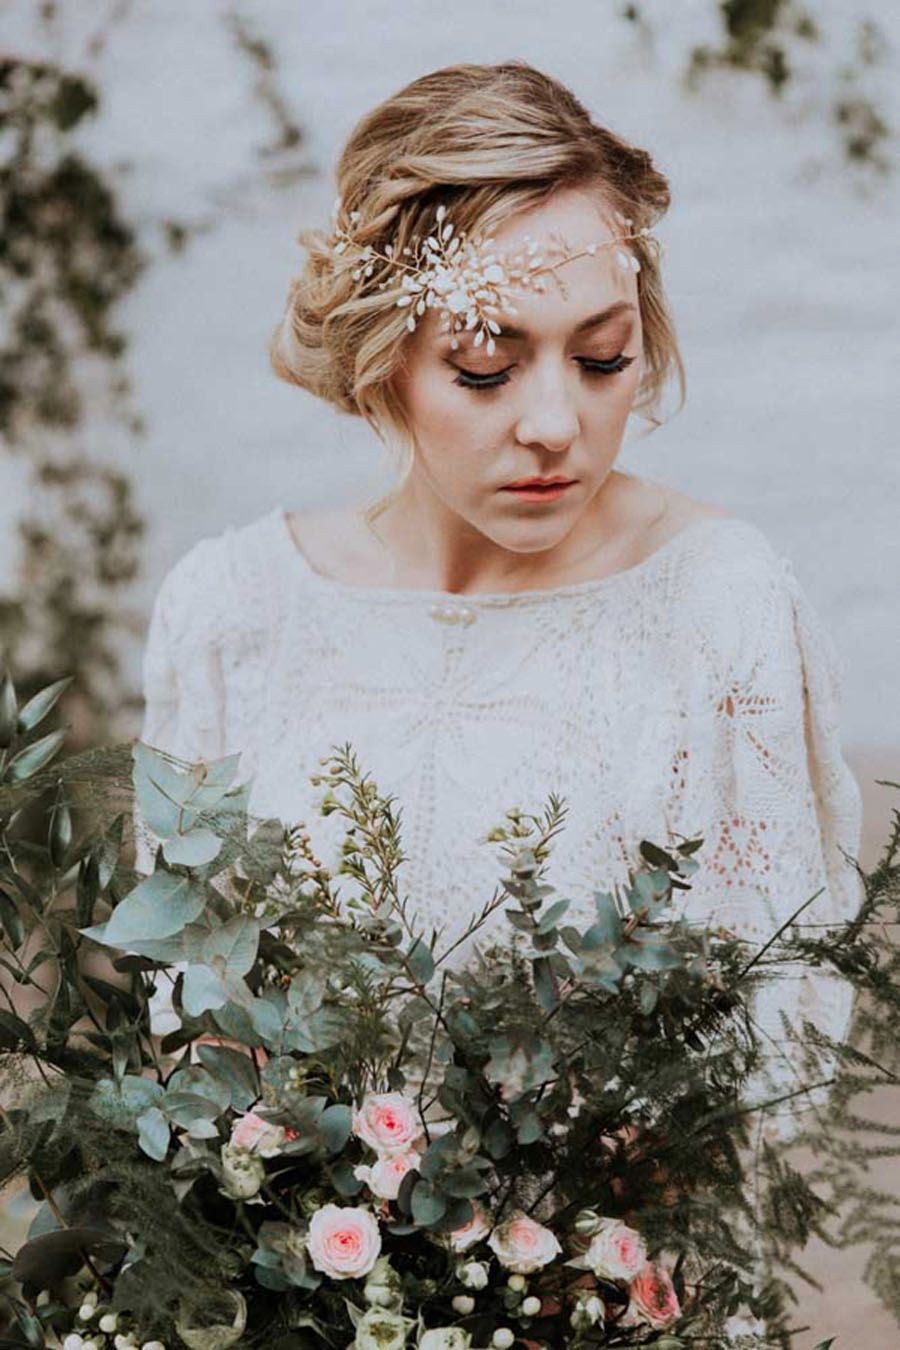 Oxi Photography Gardenia Headpiece by Clare Lloyd